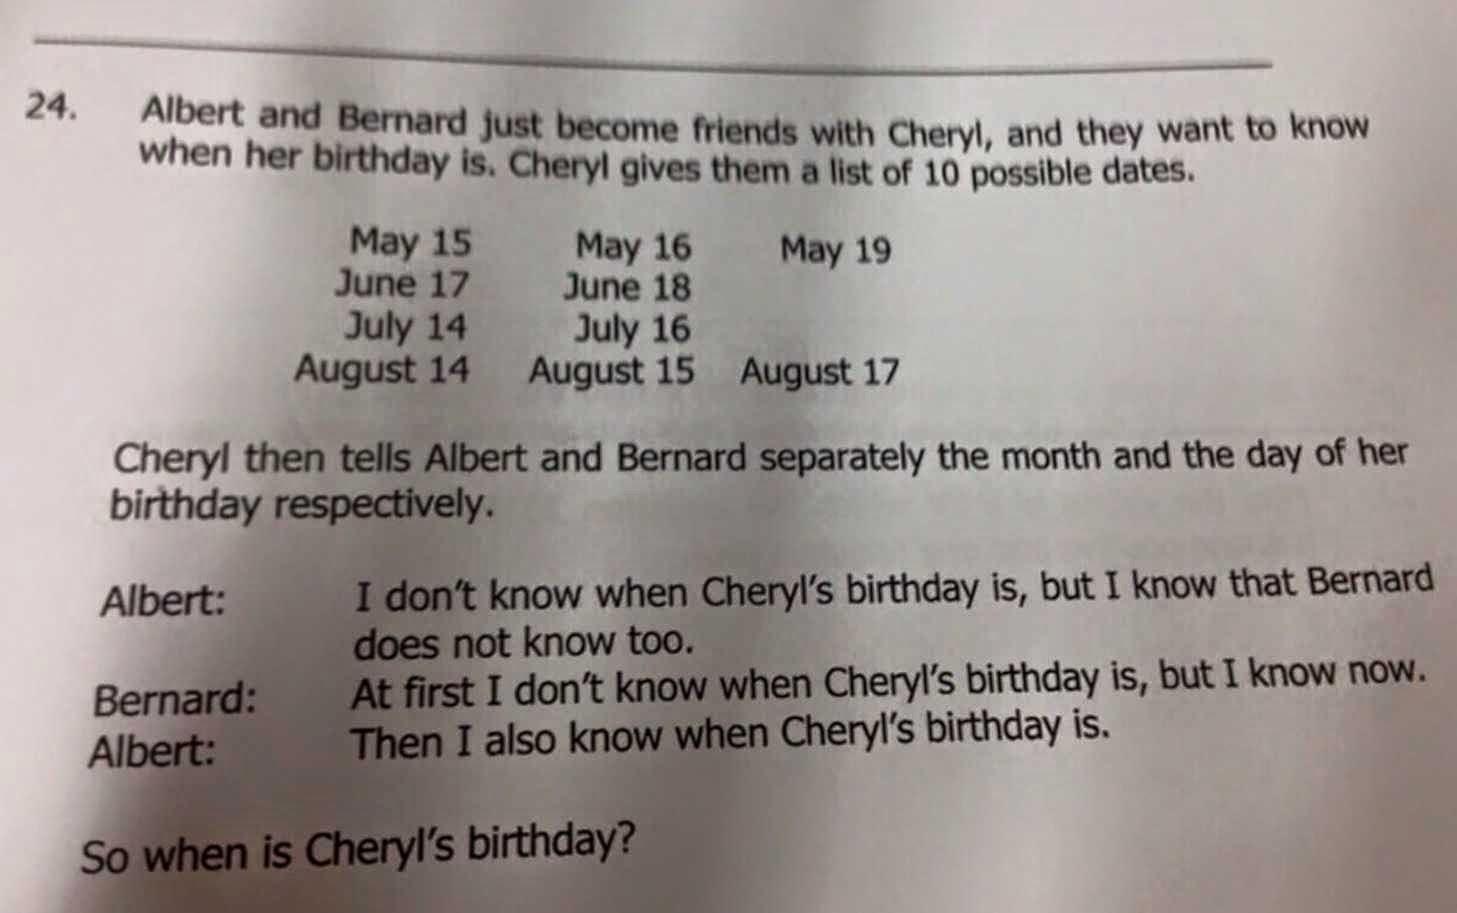 When is Cheryl's Birthday?